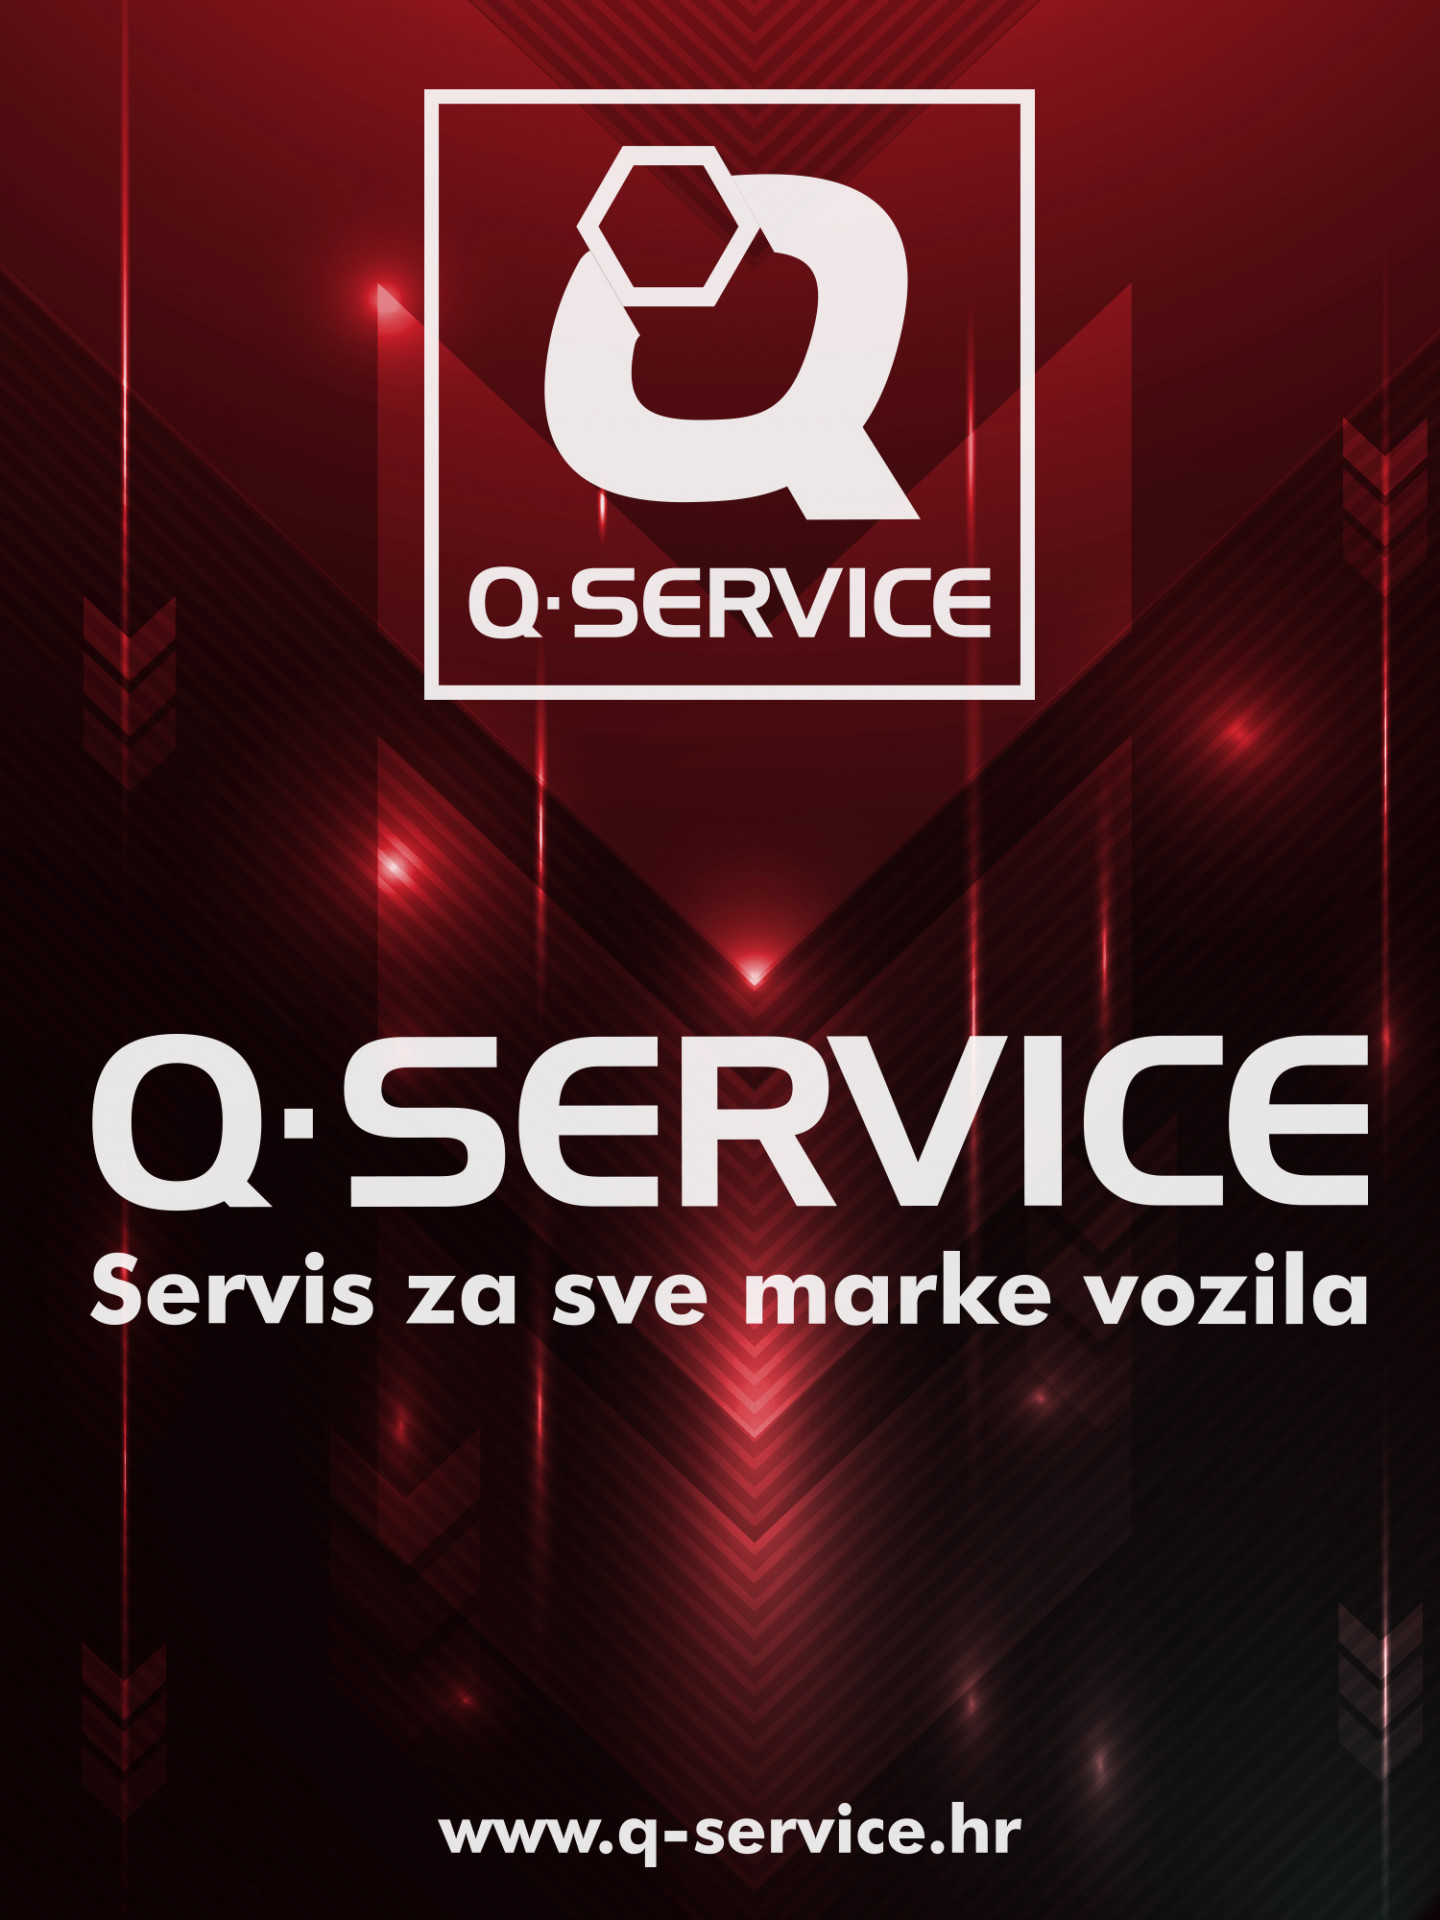 https://motointegrator.com/hr/hr/autoservisi/mre%C5%BEa-autoservisa-q-service